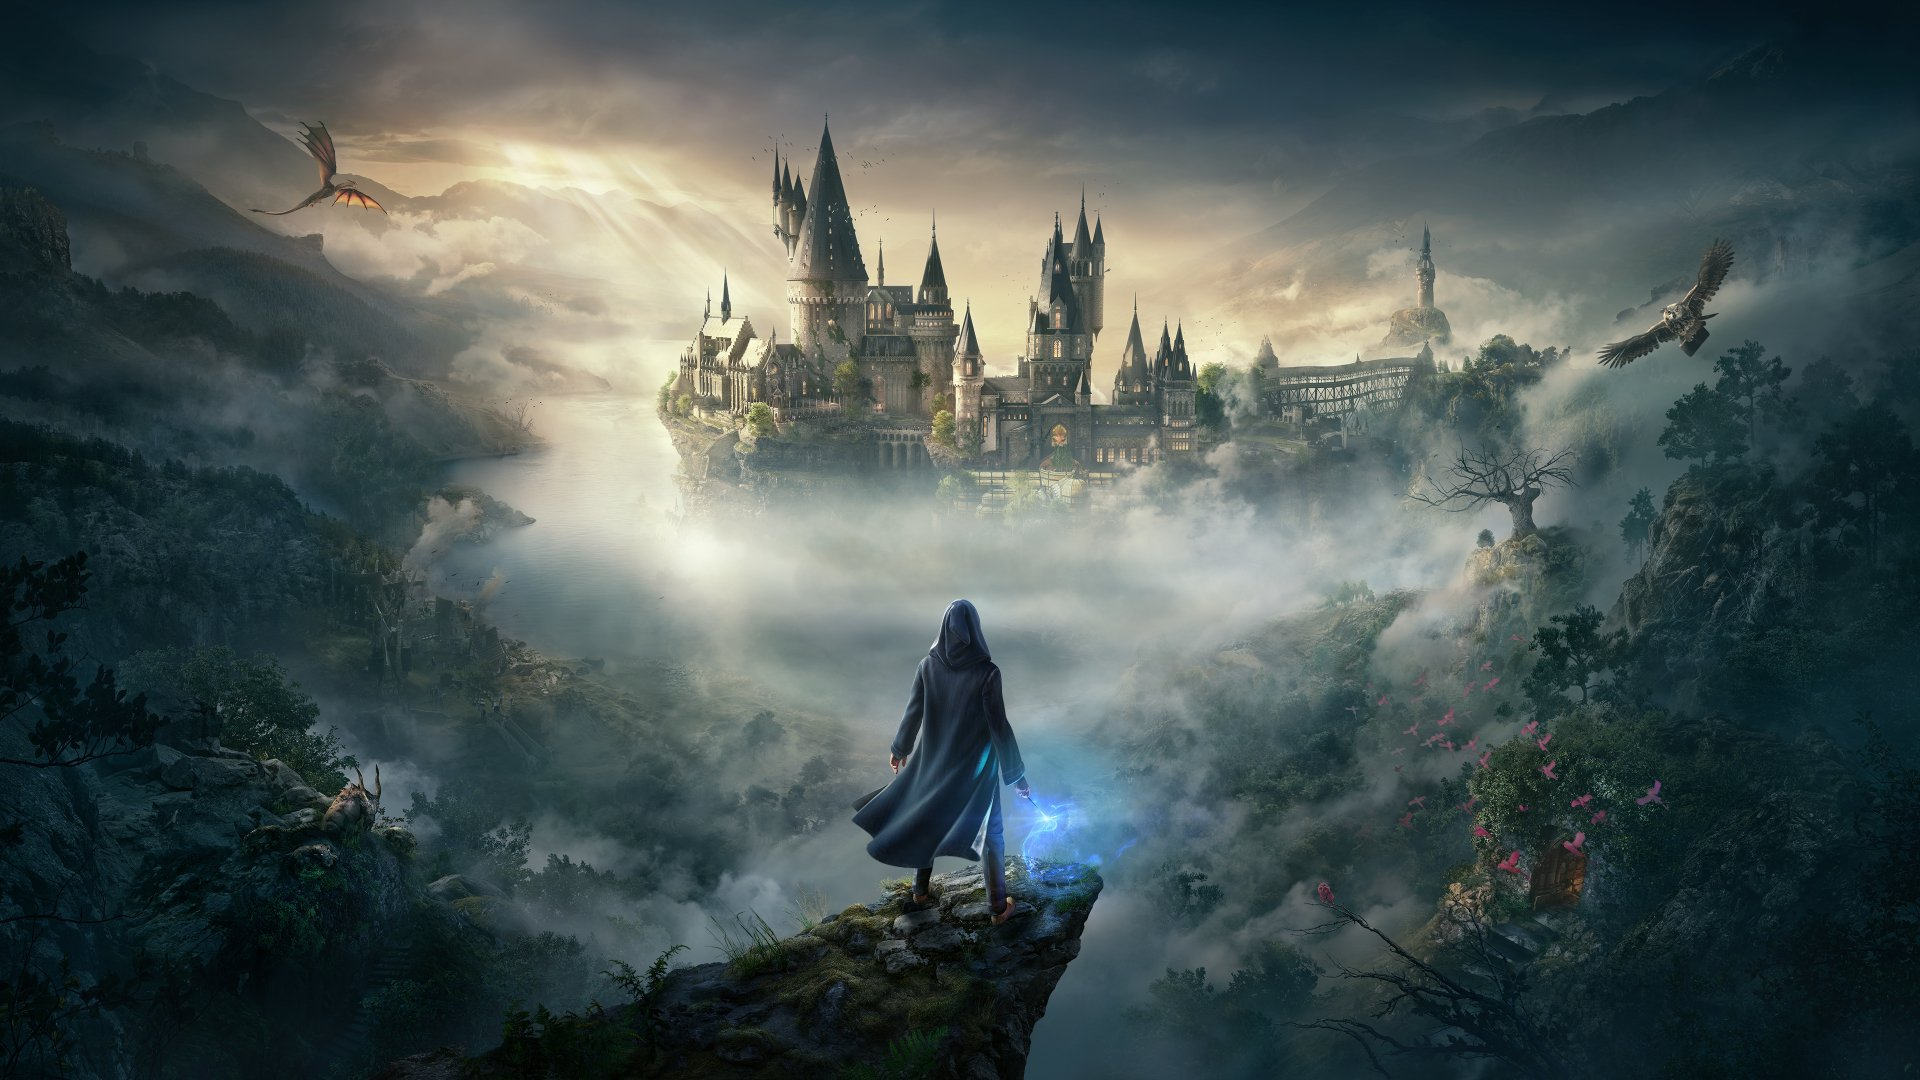 hogwarts legacy video game wallpaper 72358